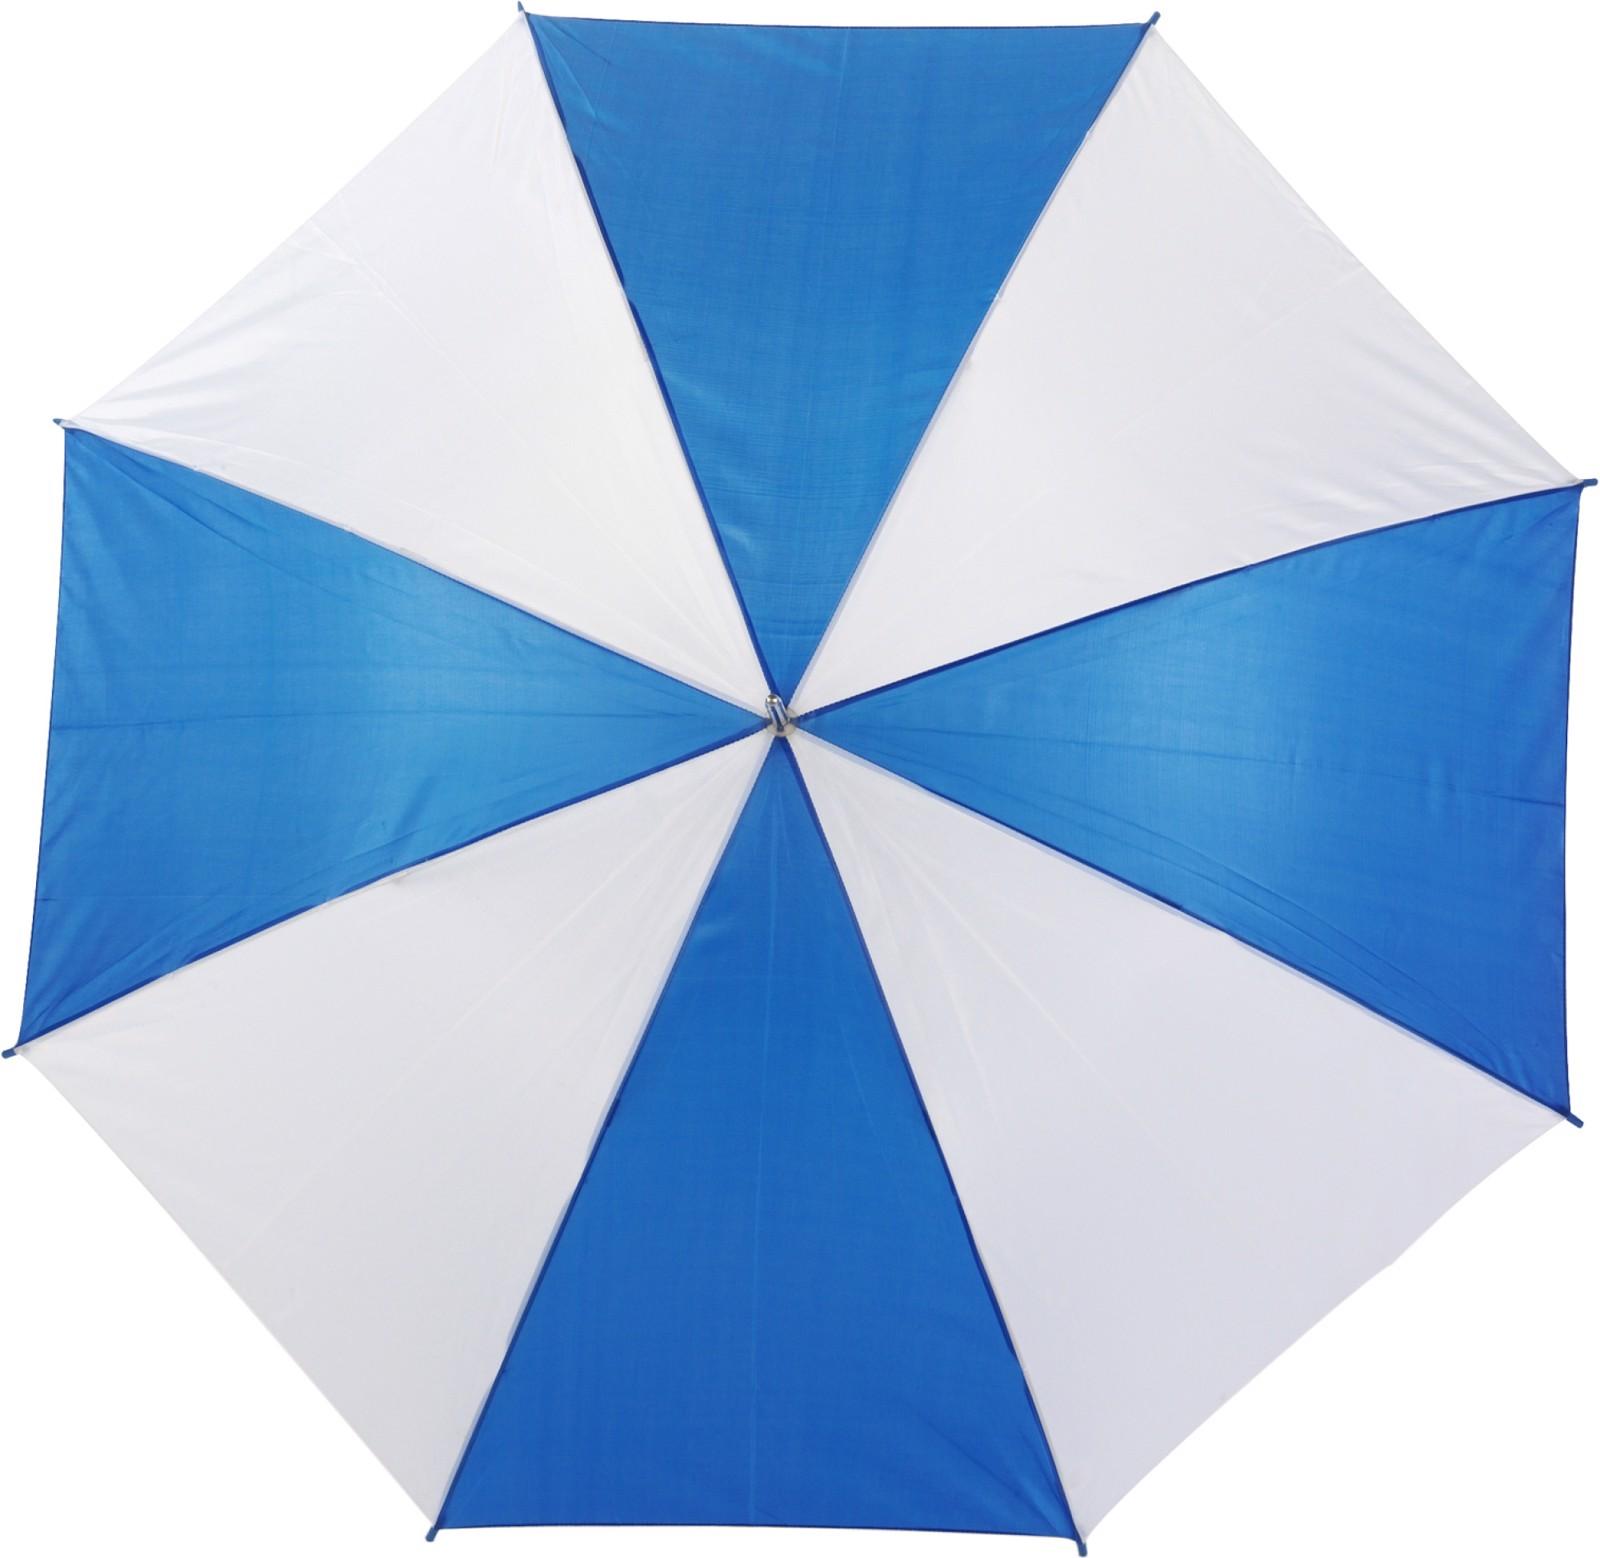 Polyester (190T) umbrella - Blue / White